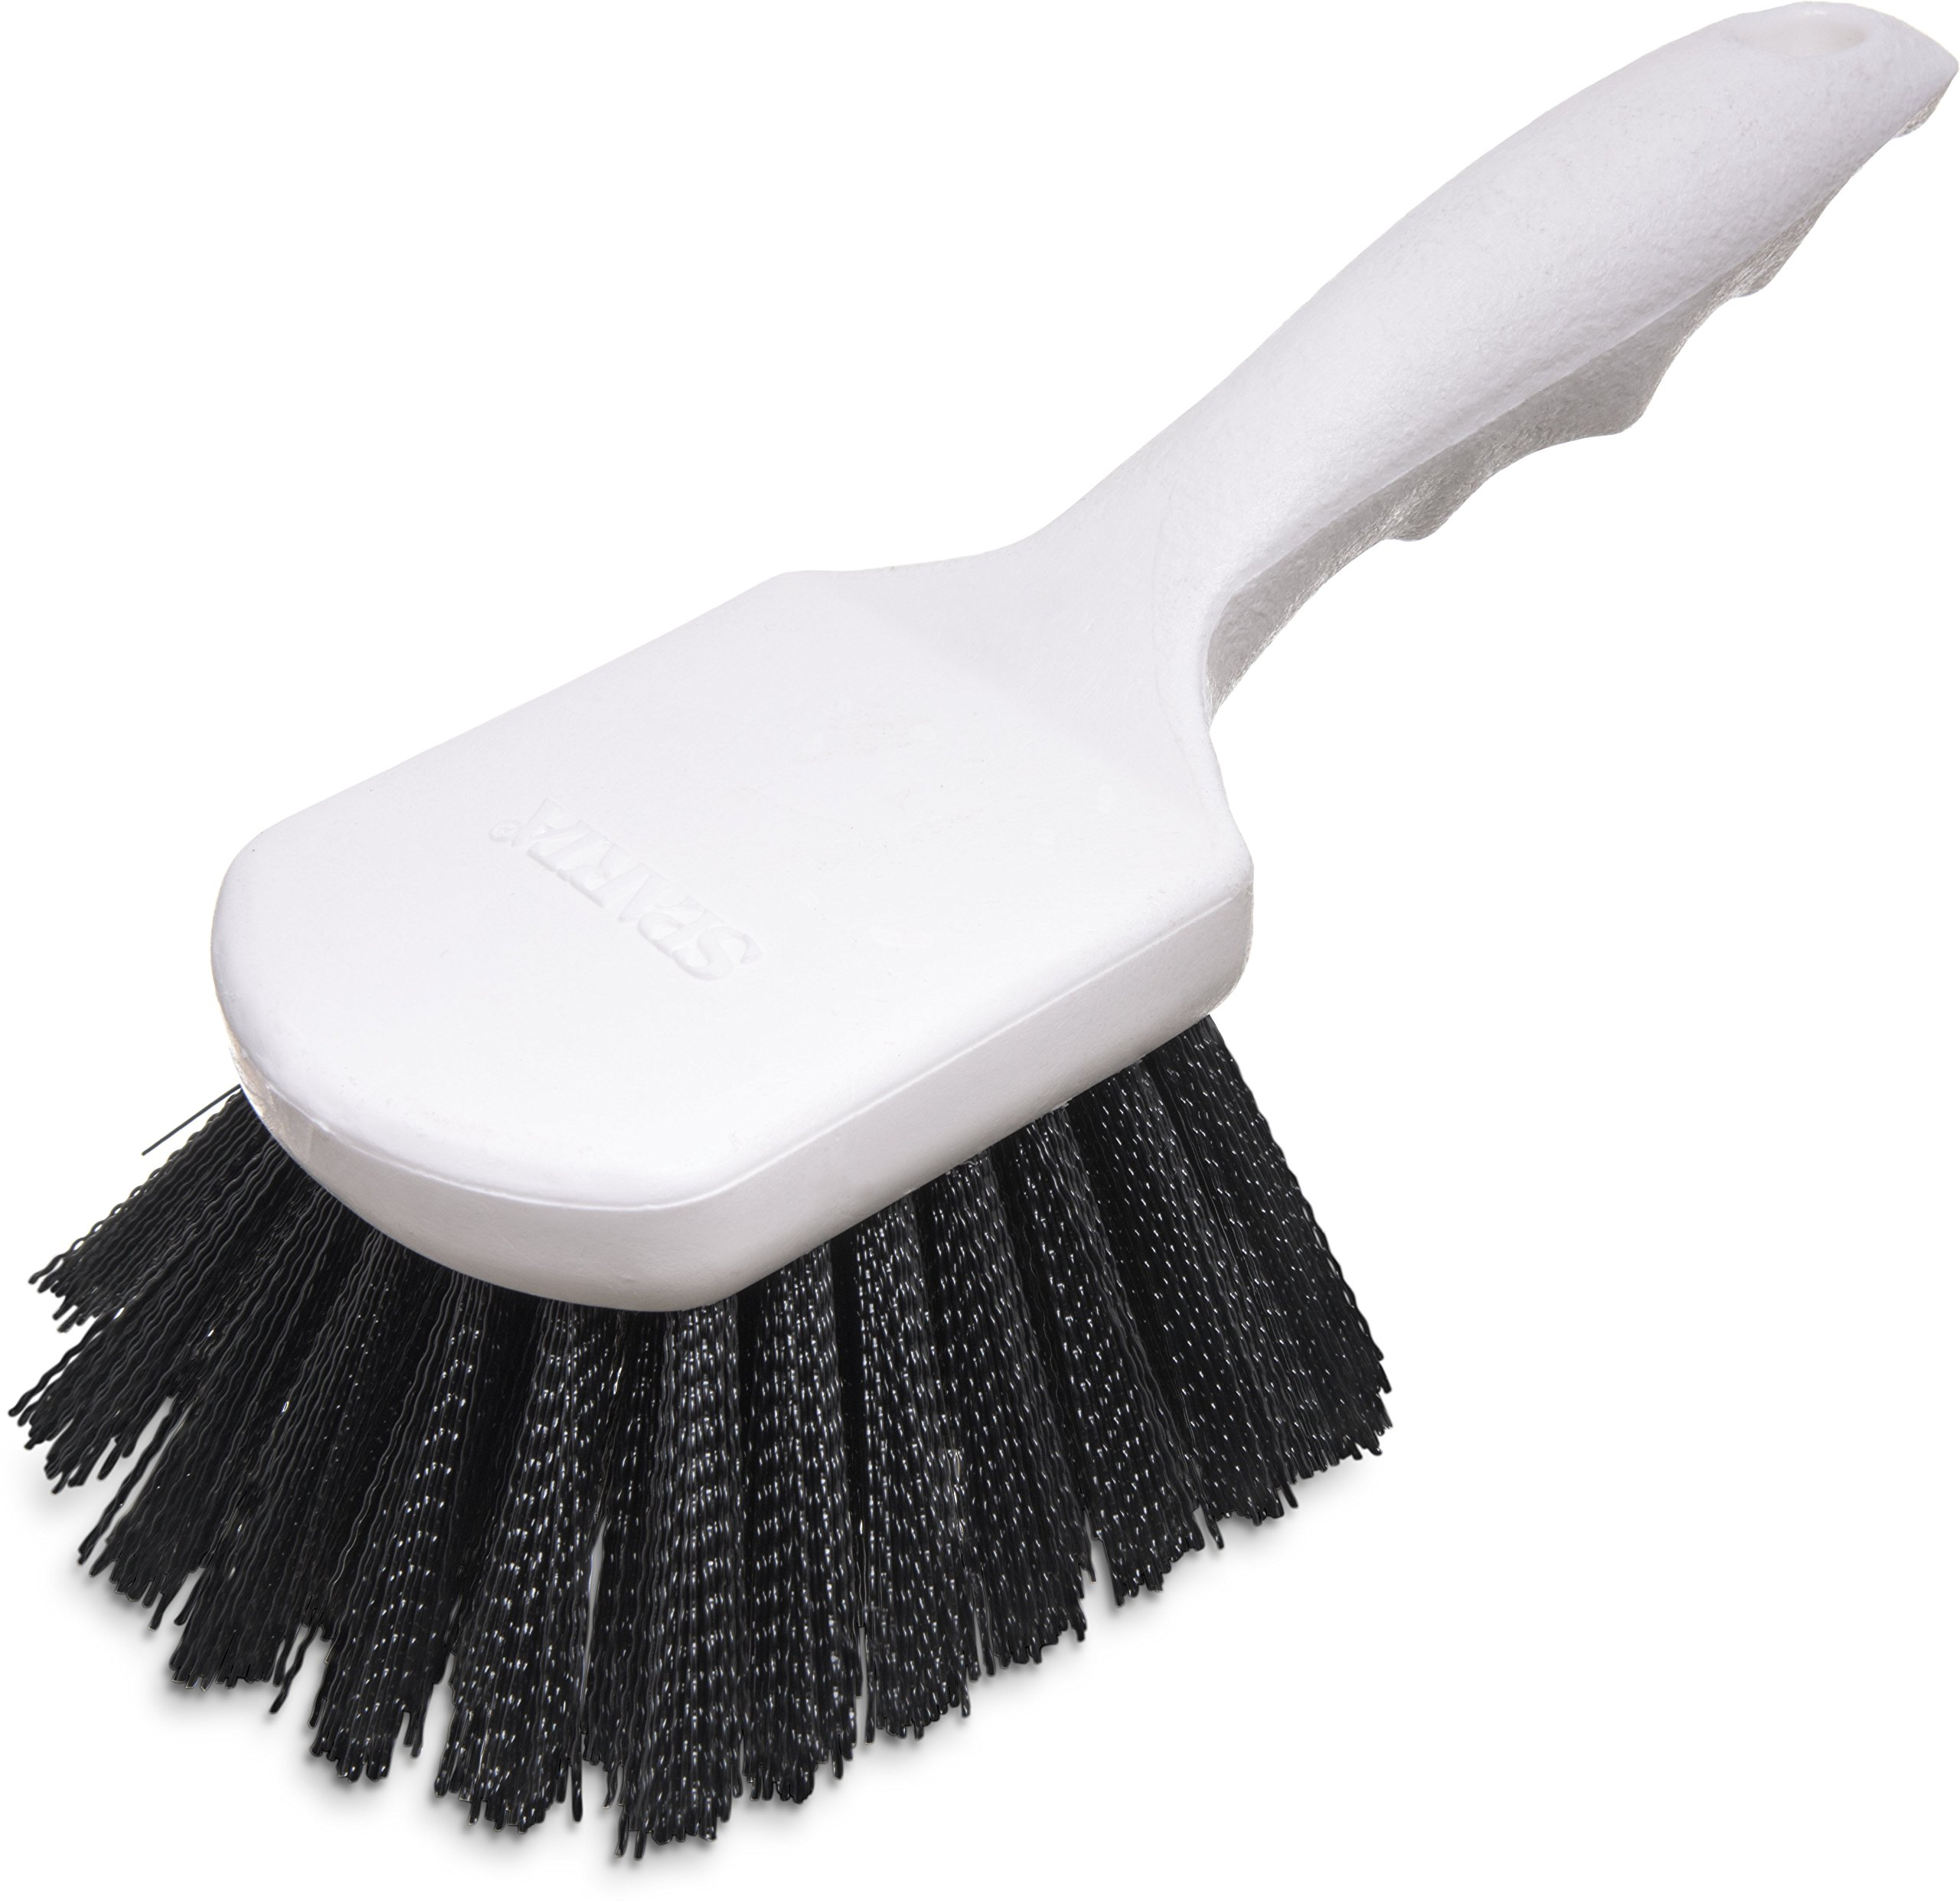 Carlisle 4054103 Sparta Utility Scrub Brush, 8'' x 3'', Black (Pack of 12)